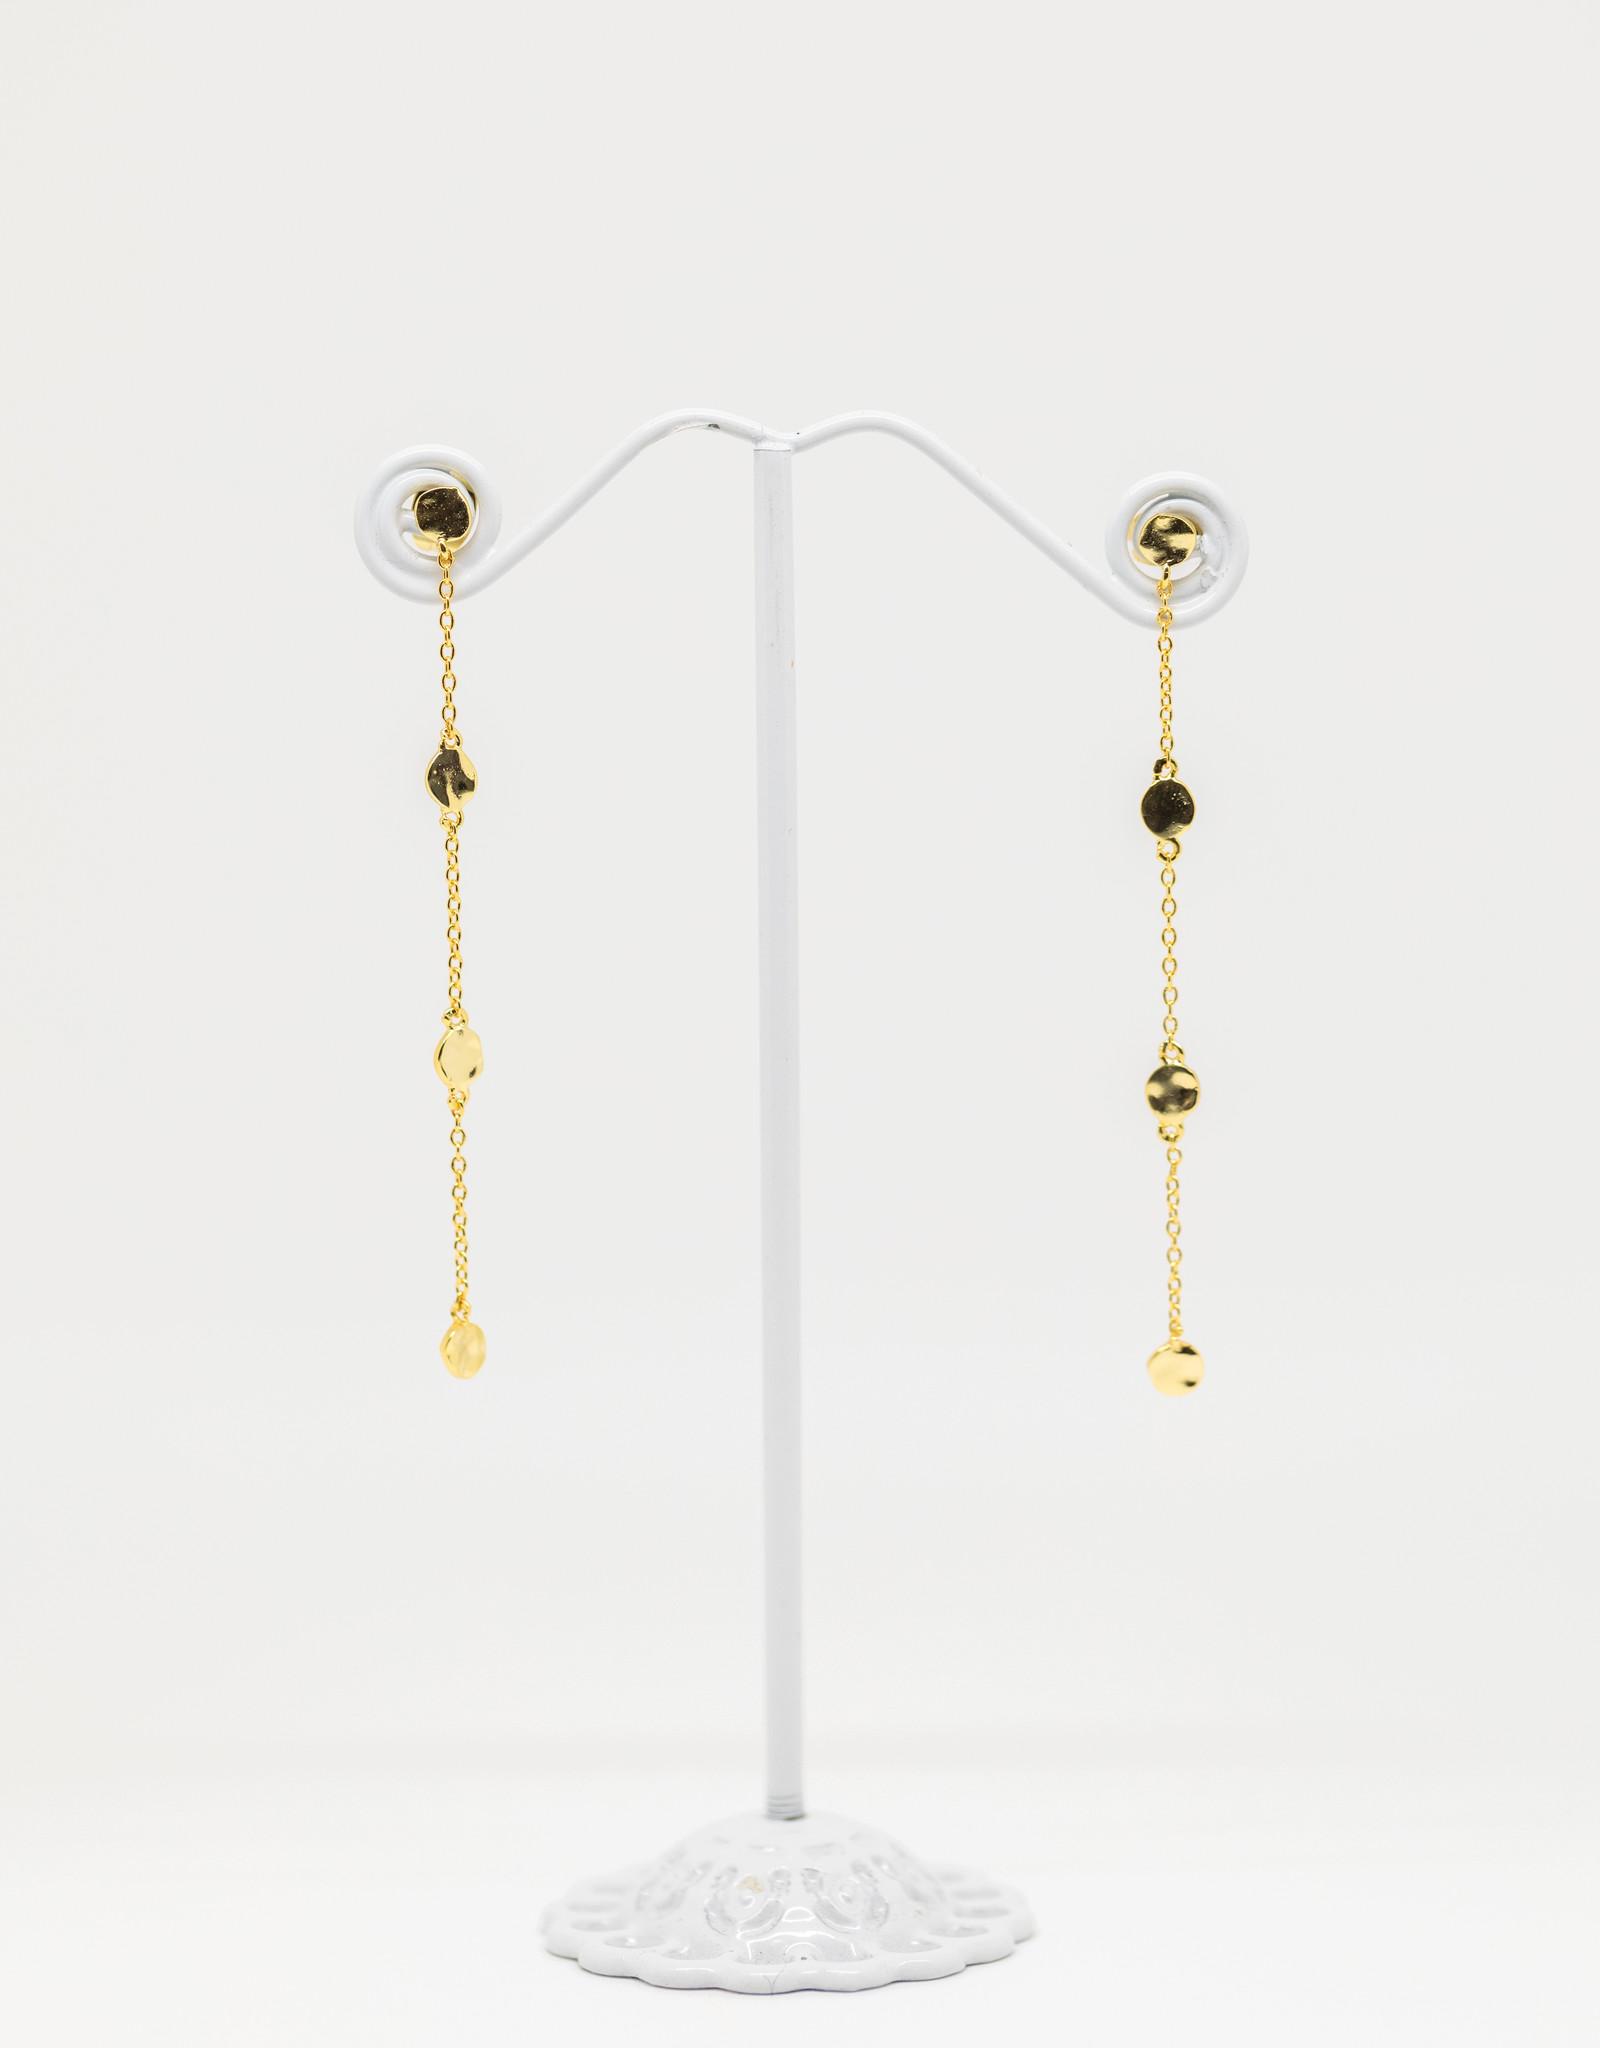 Gorjana Chloe Chain Earrings